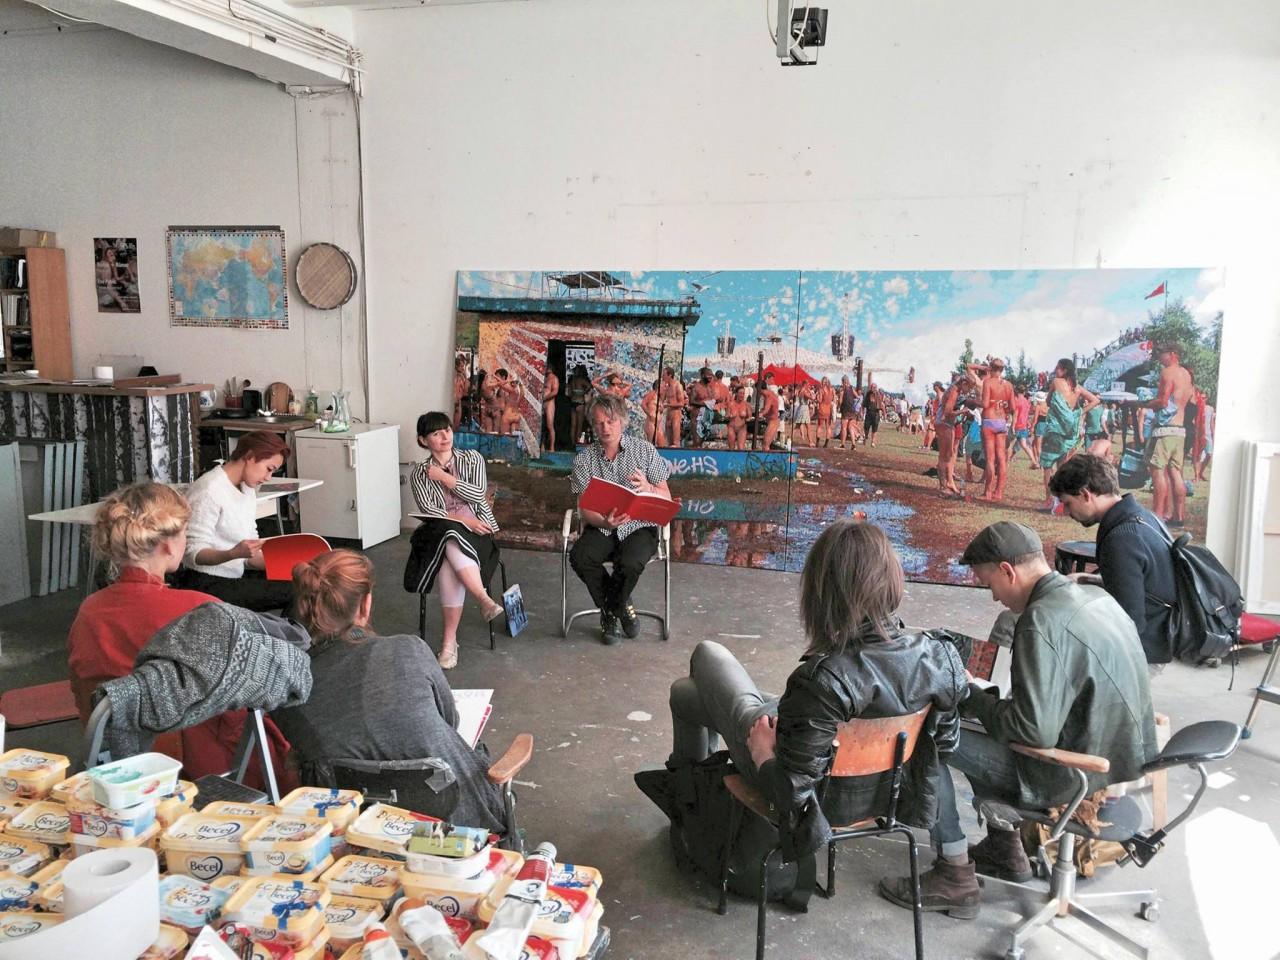 Students of Berlin Weissensee Art Academy visiting the studio of Römer + Römer. Photograph by Minor Alexander